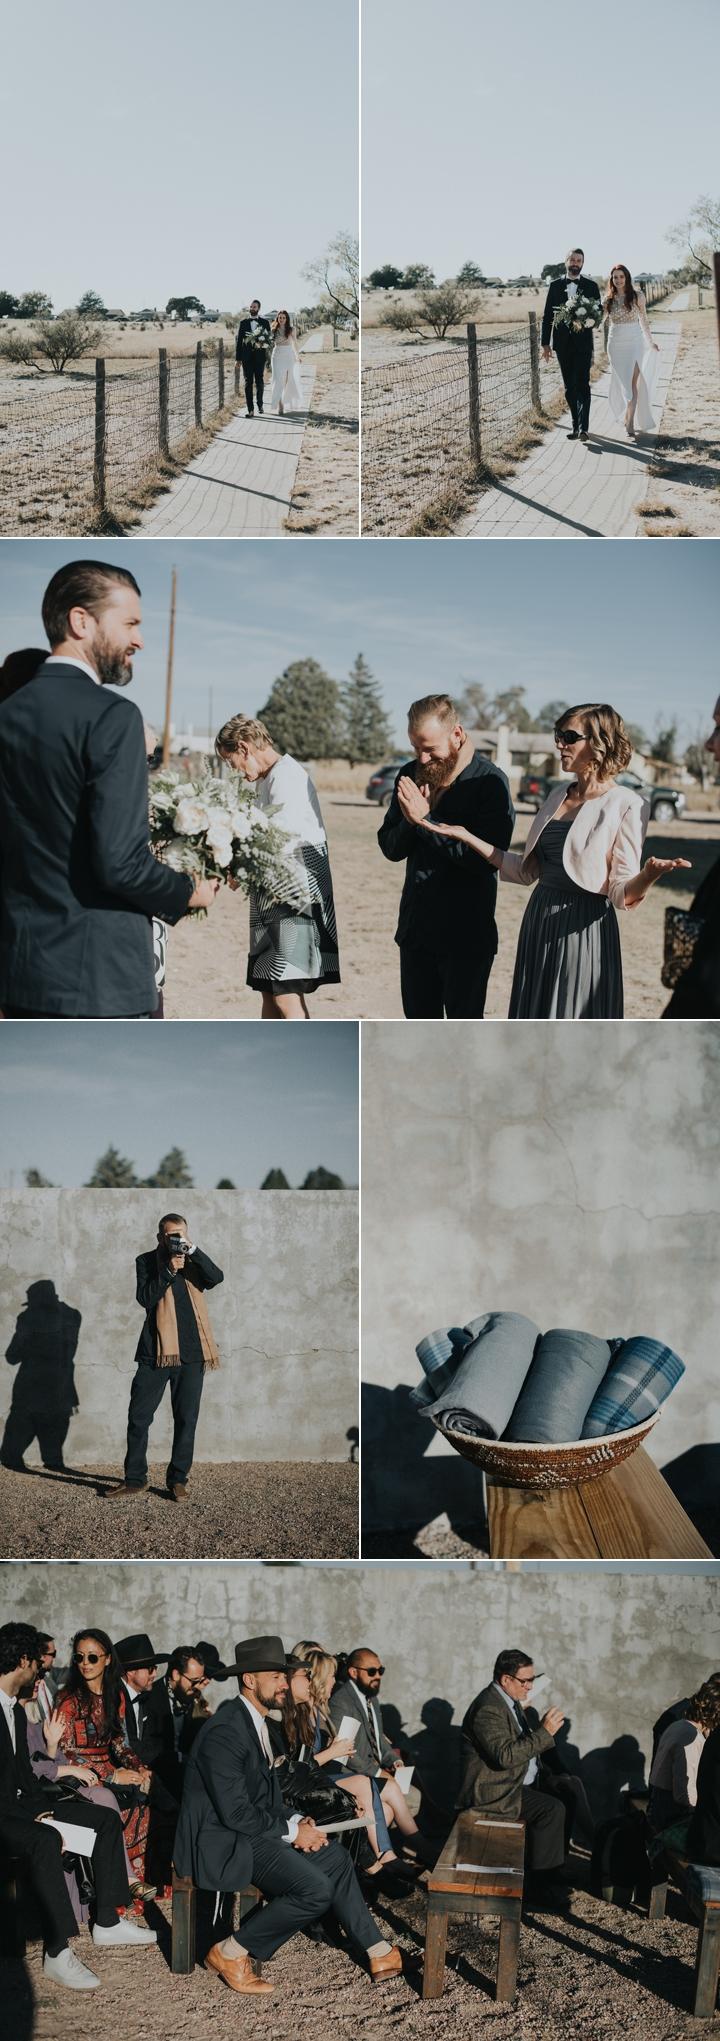 marfa-texas-weddings-photographers 26.jpg